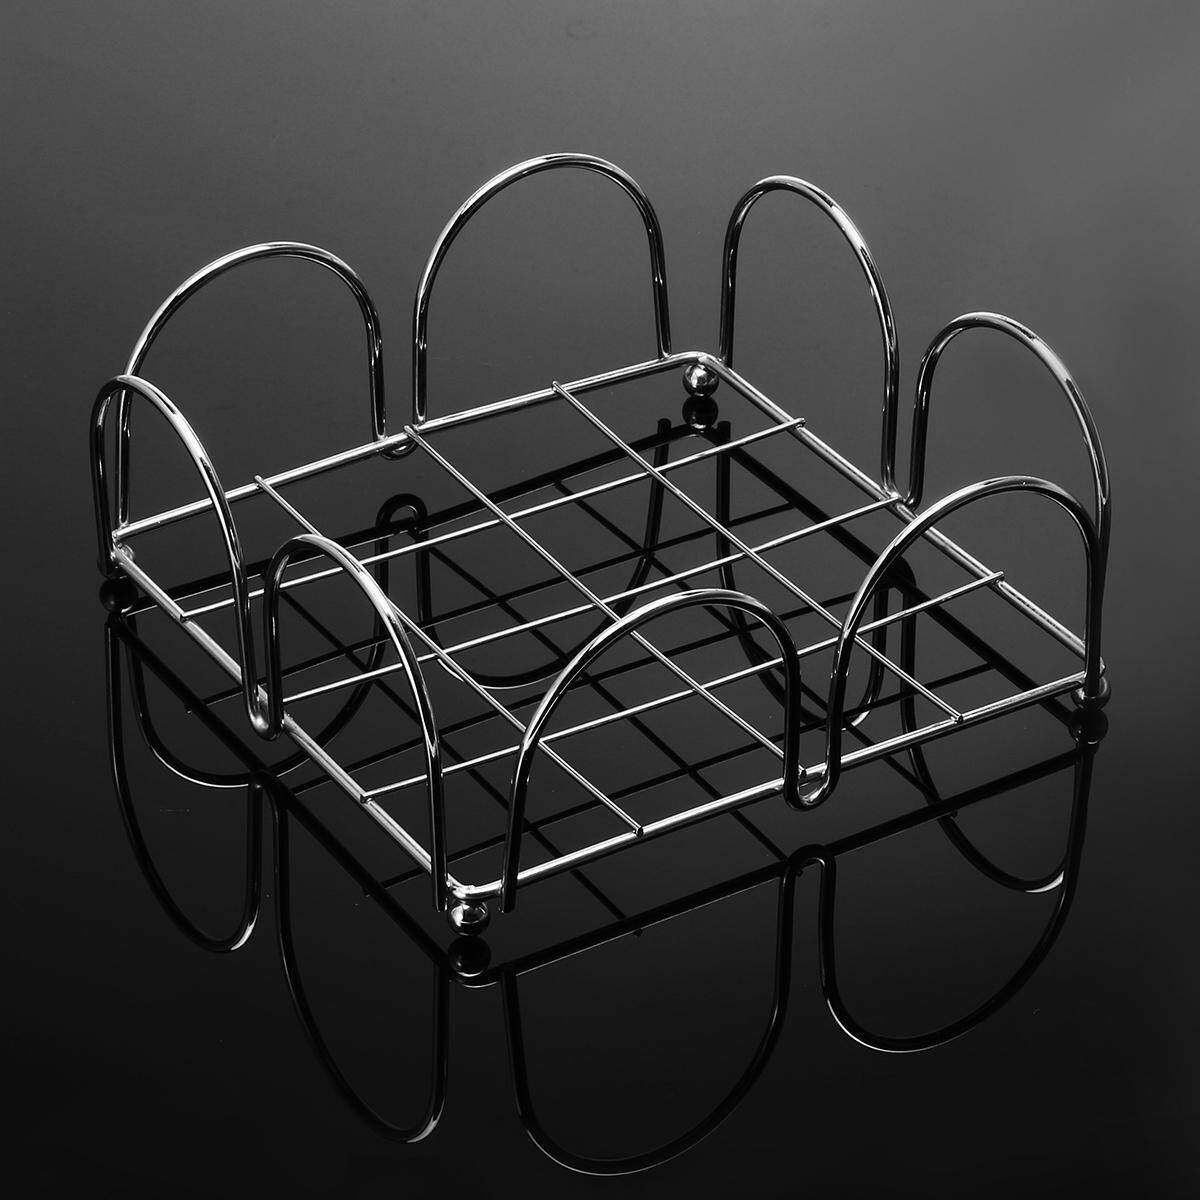 Napkin Holders Home Kitchen Wire Serviette Holder Napkin Dispenser Kitchen Dining Room Table Decor